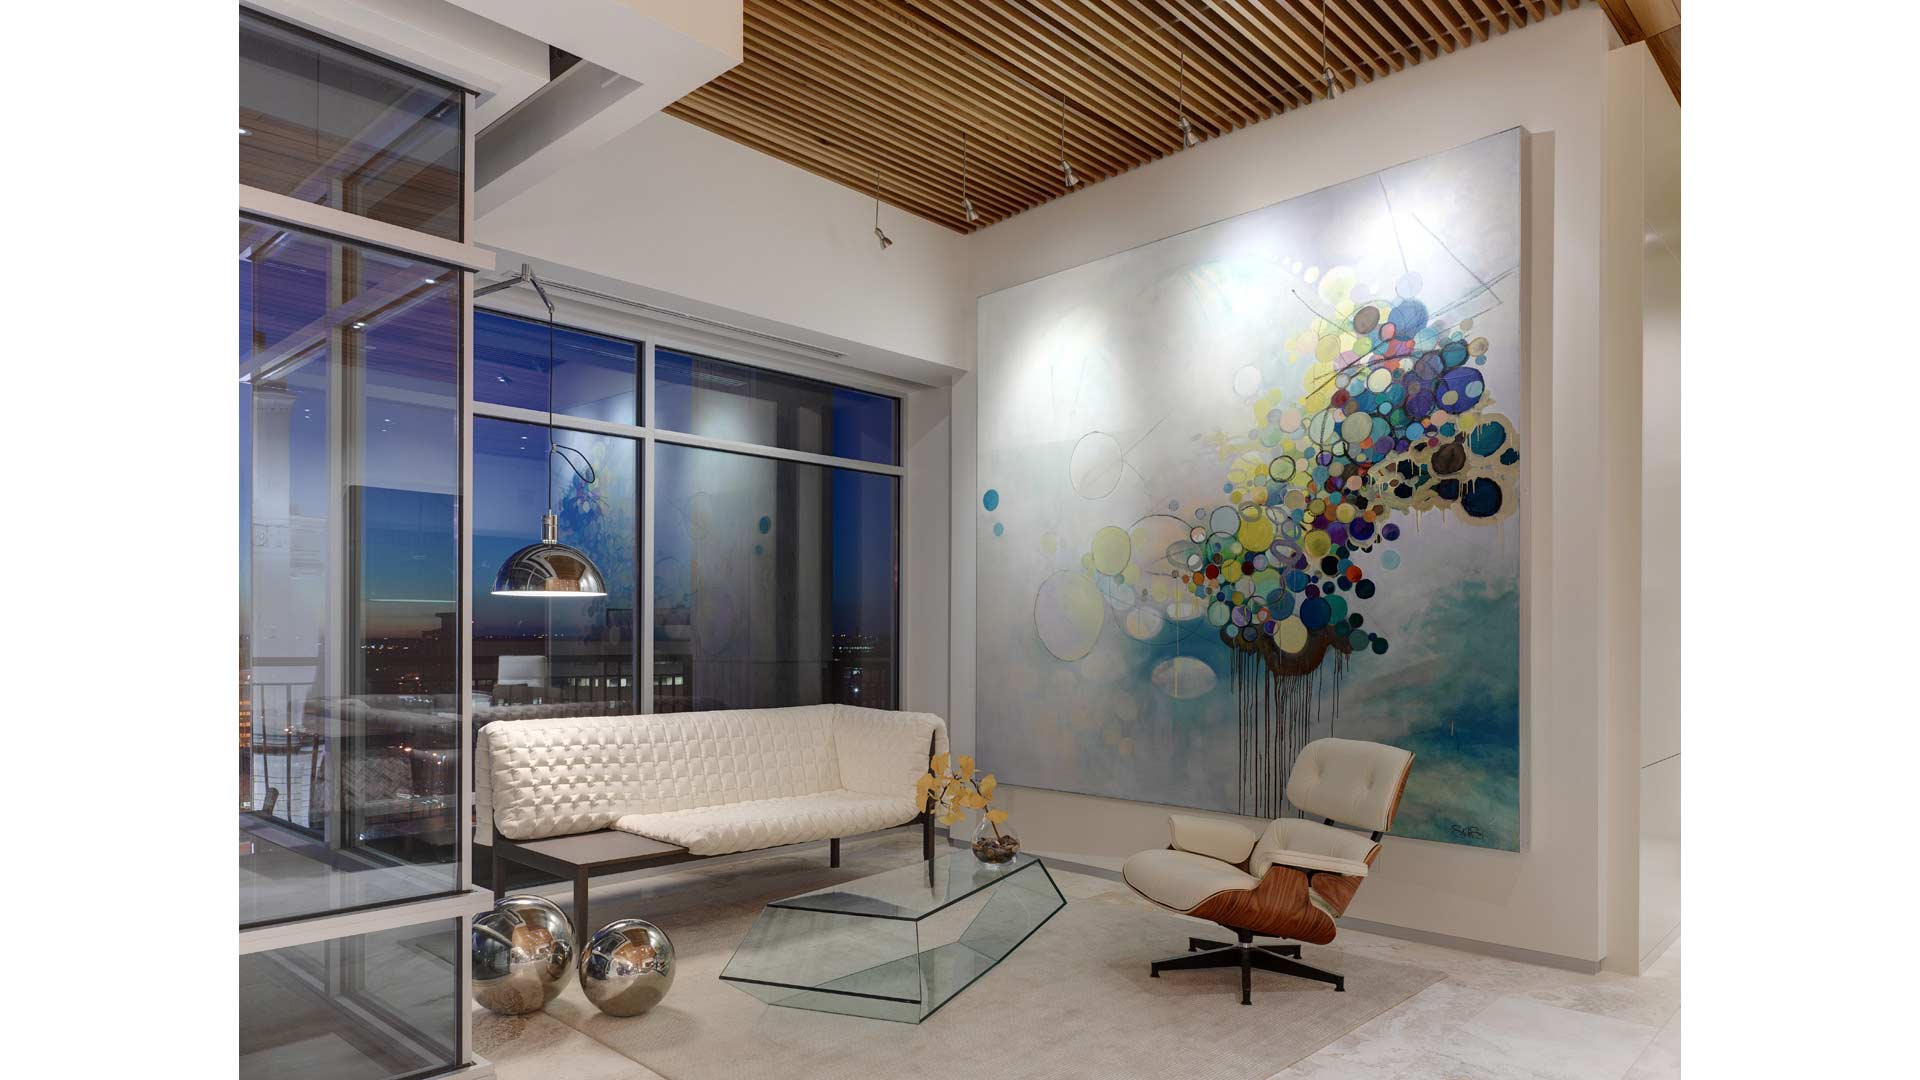 Adagio Penthouse Interior - Massive Art Wall Detail - HAUS Architecture, Christopher Short, Indianapolis Architect